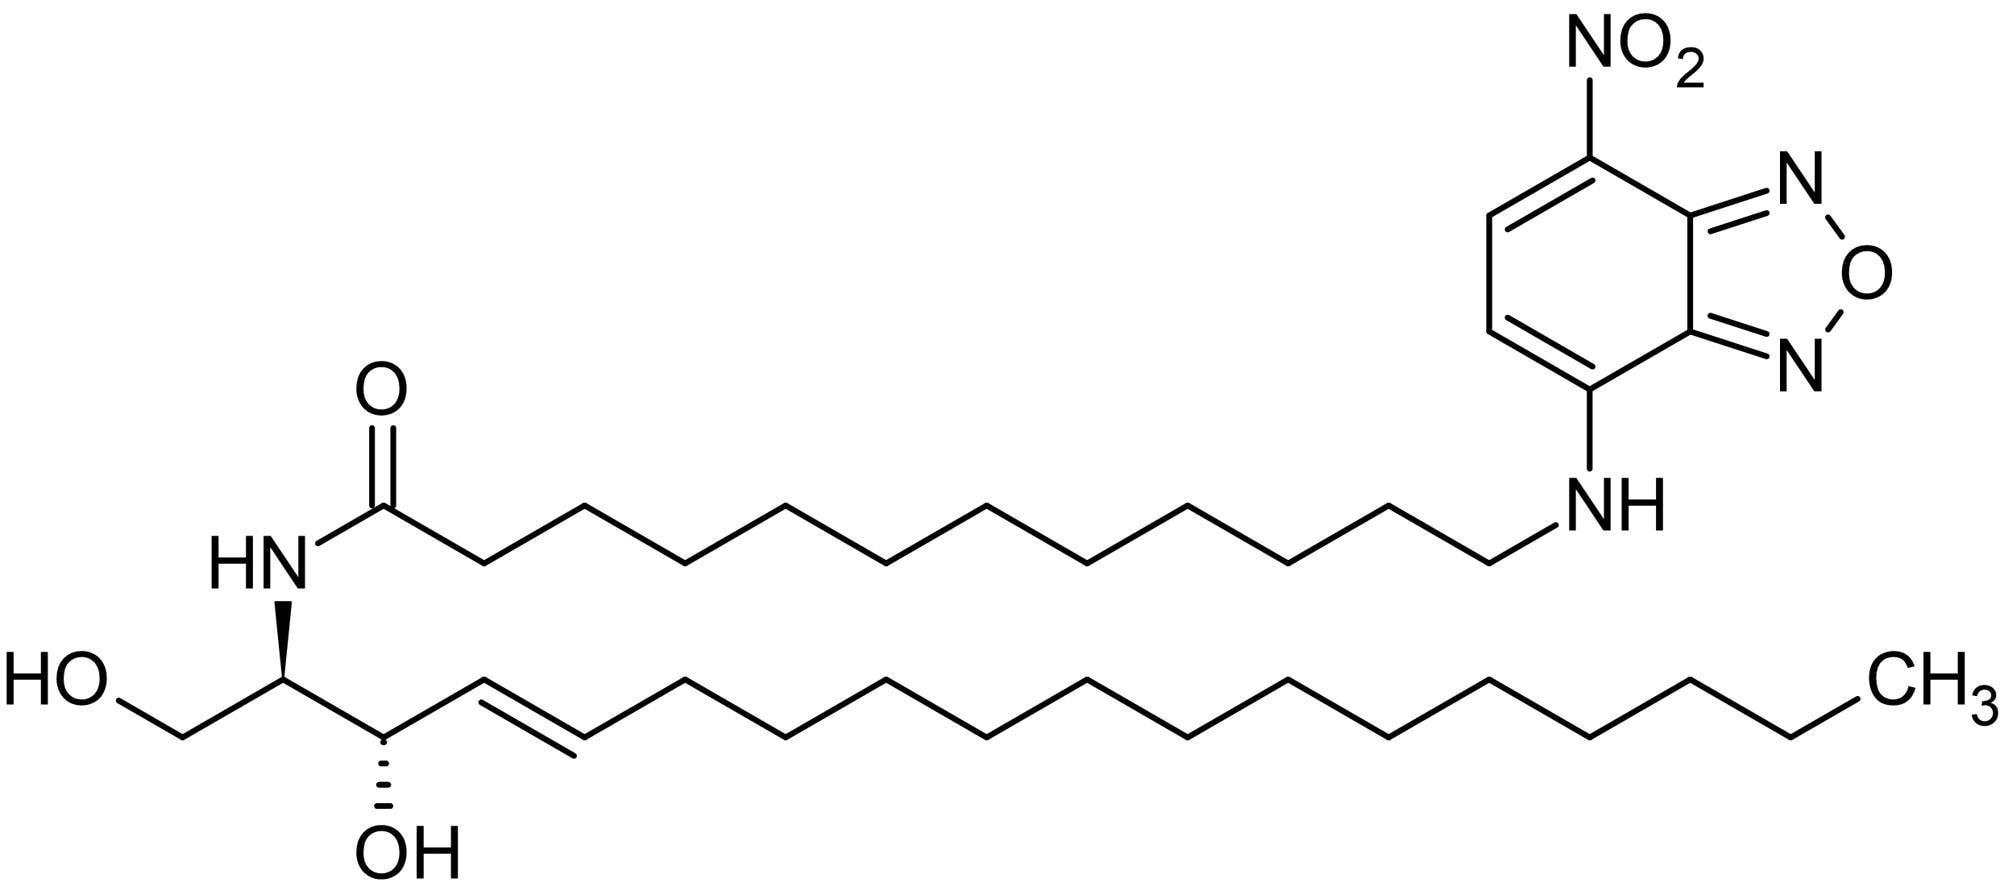 Chemical Structure - N-Dodecanoyl-NBD-D-erythro-sphingosine, Fluorescent C12:0-sphingosine ceramide analog (ab143985)